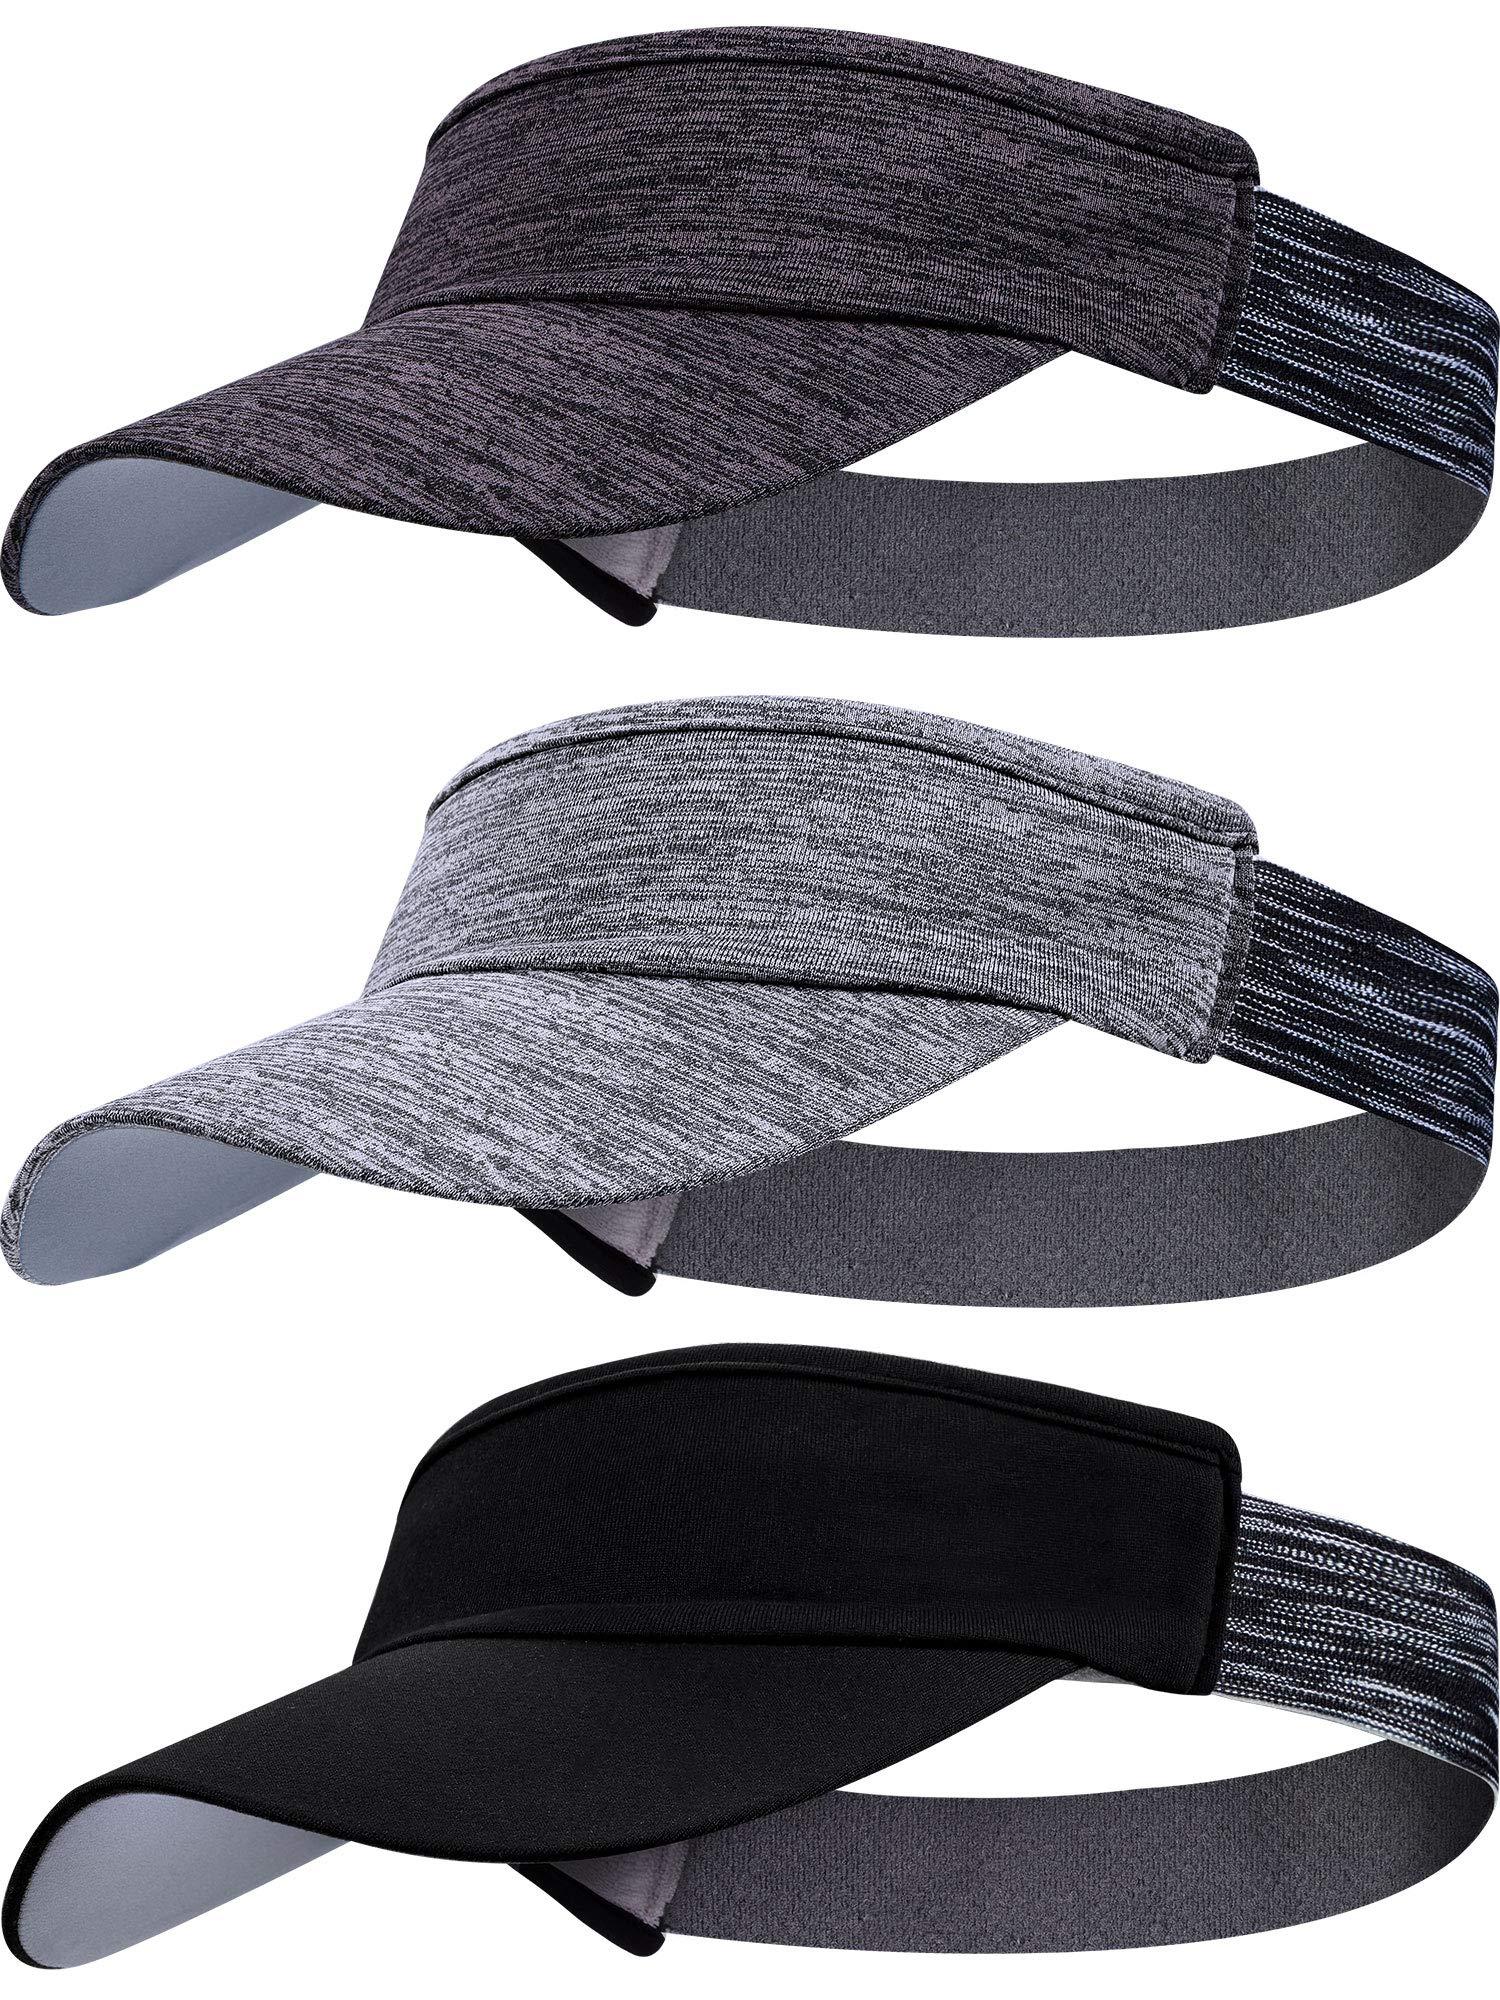 3 Pieces Sun Visor Caps for Women Men Adjustable Sports Visor Hats for Golf Cycling Running Headband